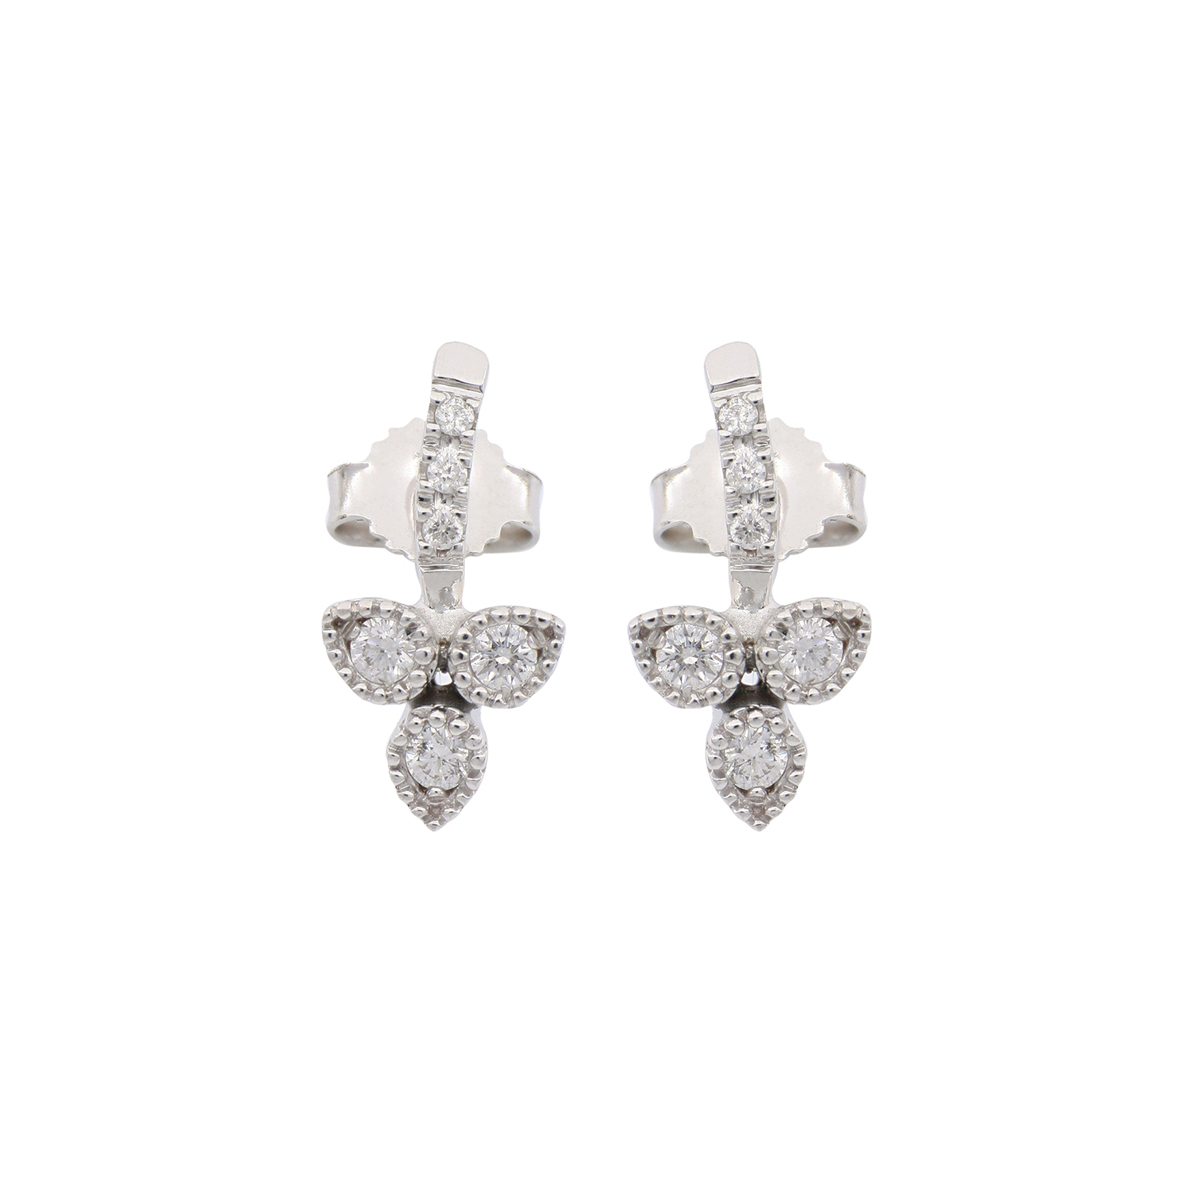 White Gold Trinity Earrings